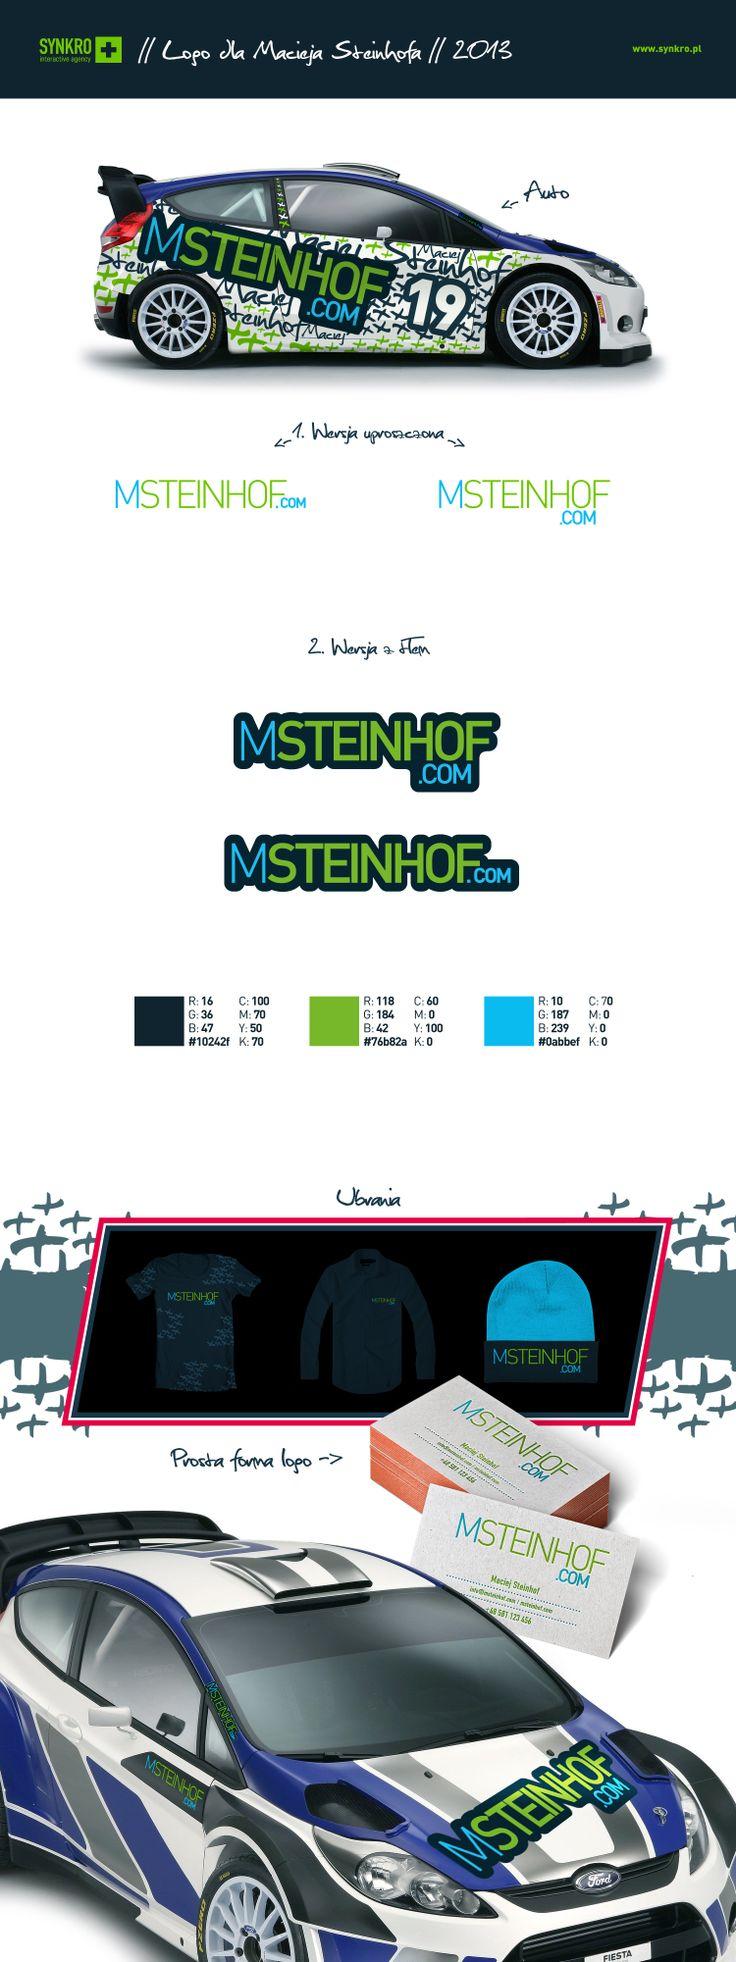 Branding for Maciej Steinhof, racing driver. #logo #logotype #id #identity #design #synkro #synkrointeractive #carbone #steinhof #maciejsteinhof #racing #rally #adac #volkswagen #volkswagencup #barborka #rajdbarborki #lodzdesign #lodz